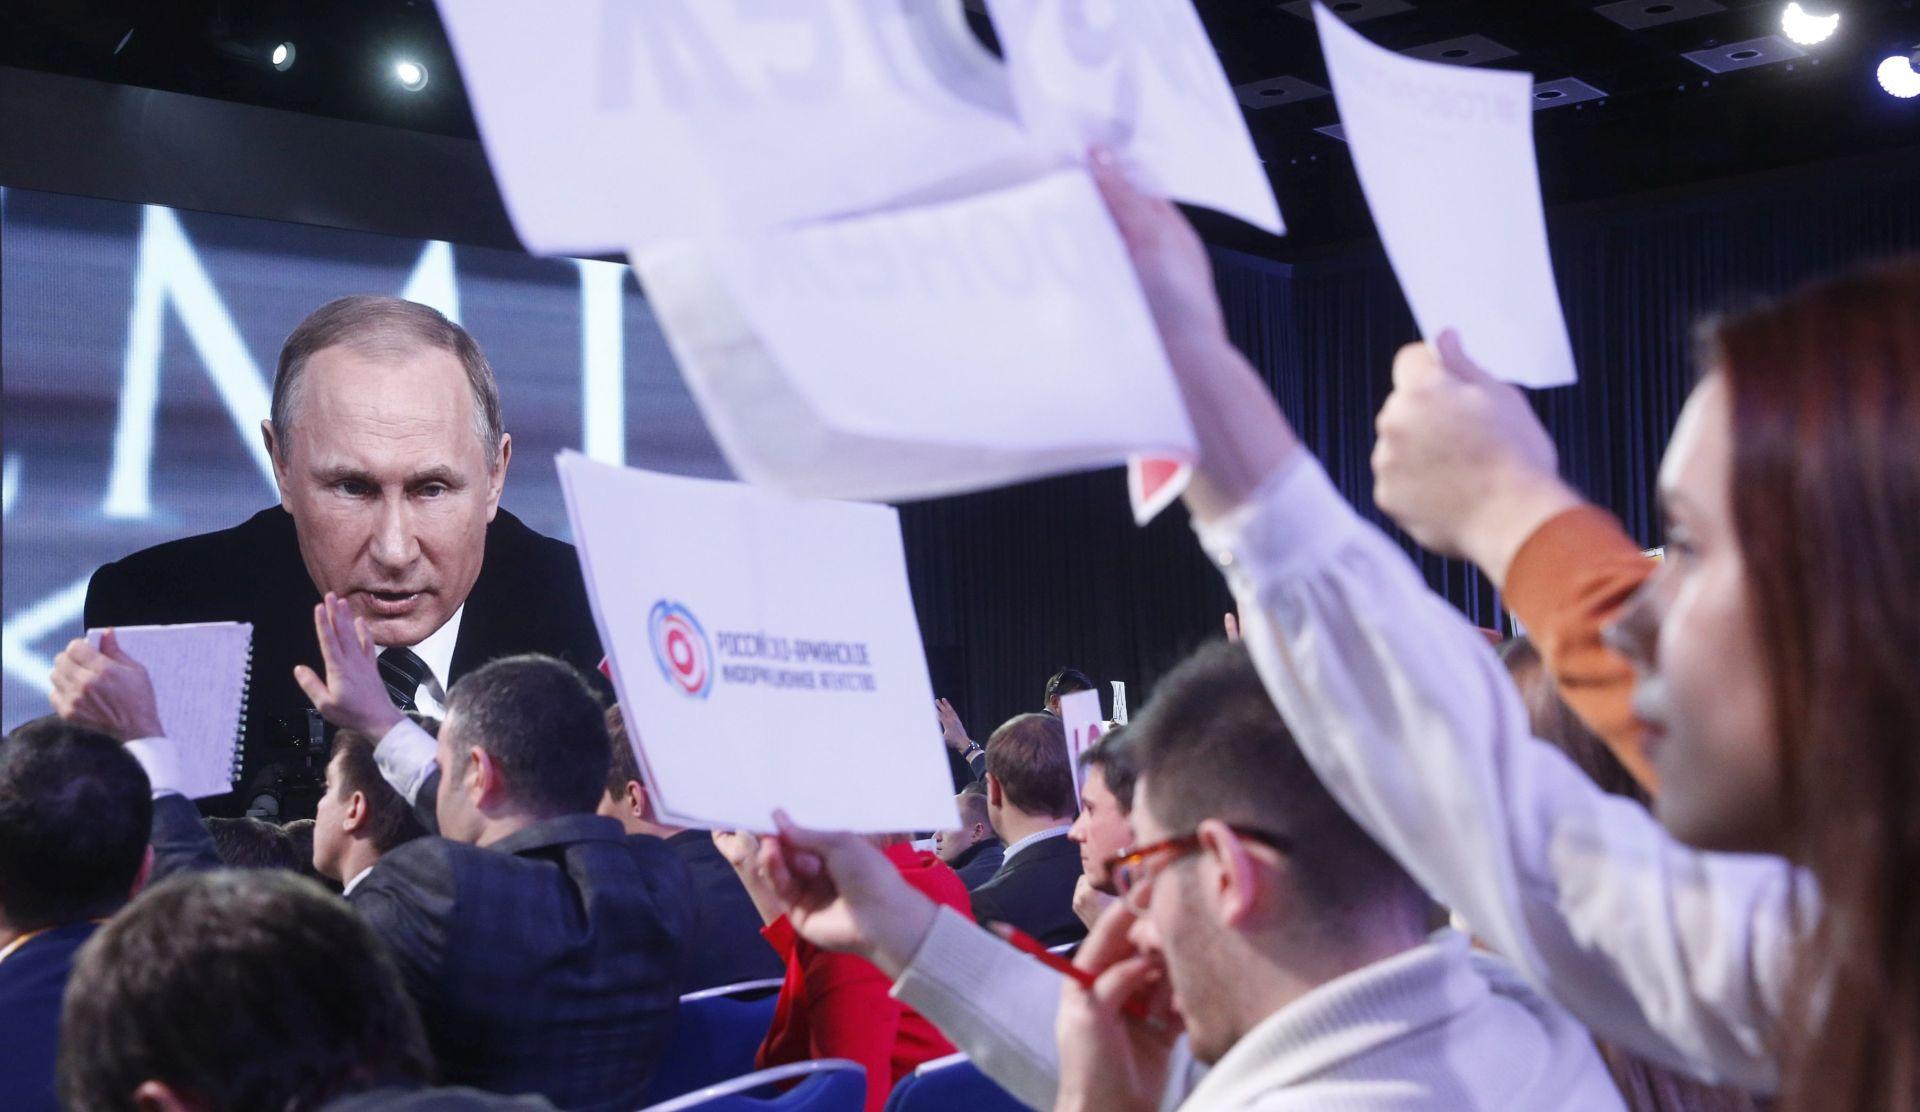 Ruska državna novinska agencija Ria Novosti zabranjena u Ukrajini